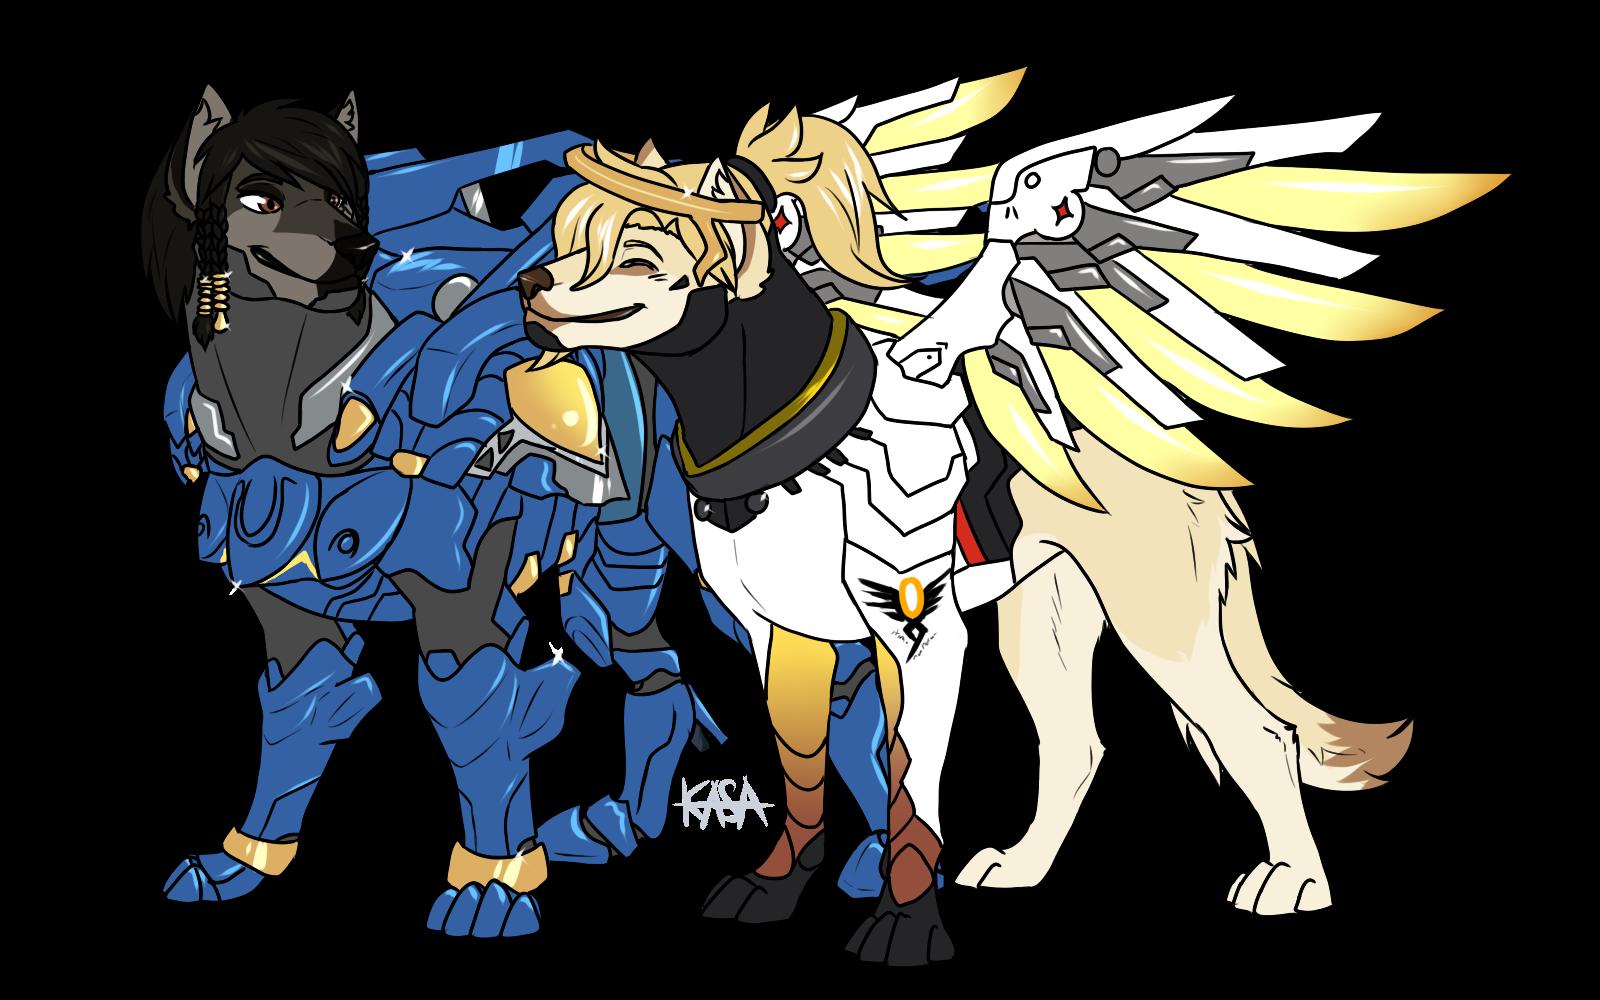 OW Phara And Mercy Dog AU By Kasaru2911 On DeviantArt